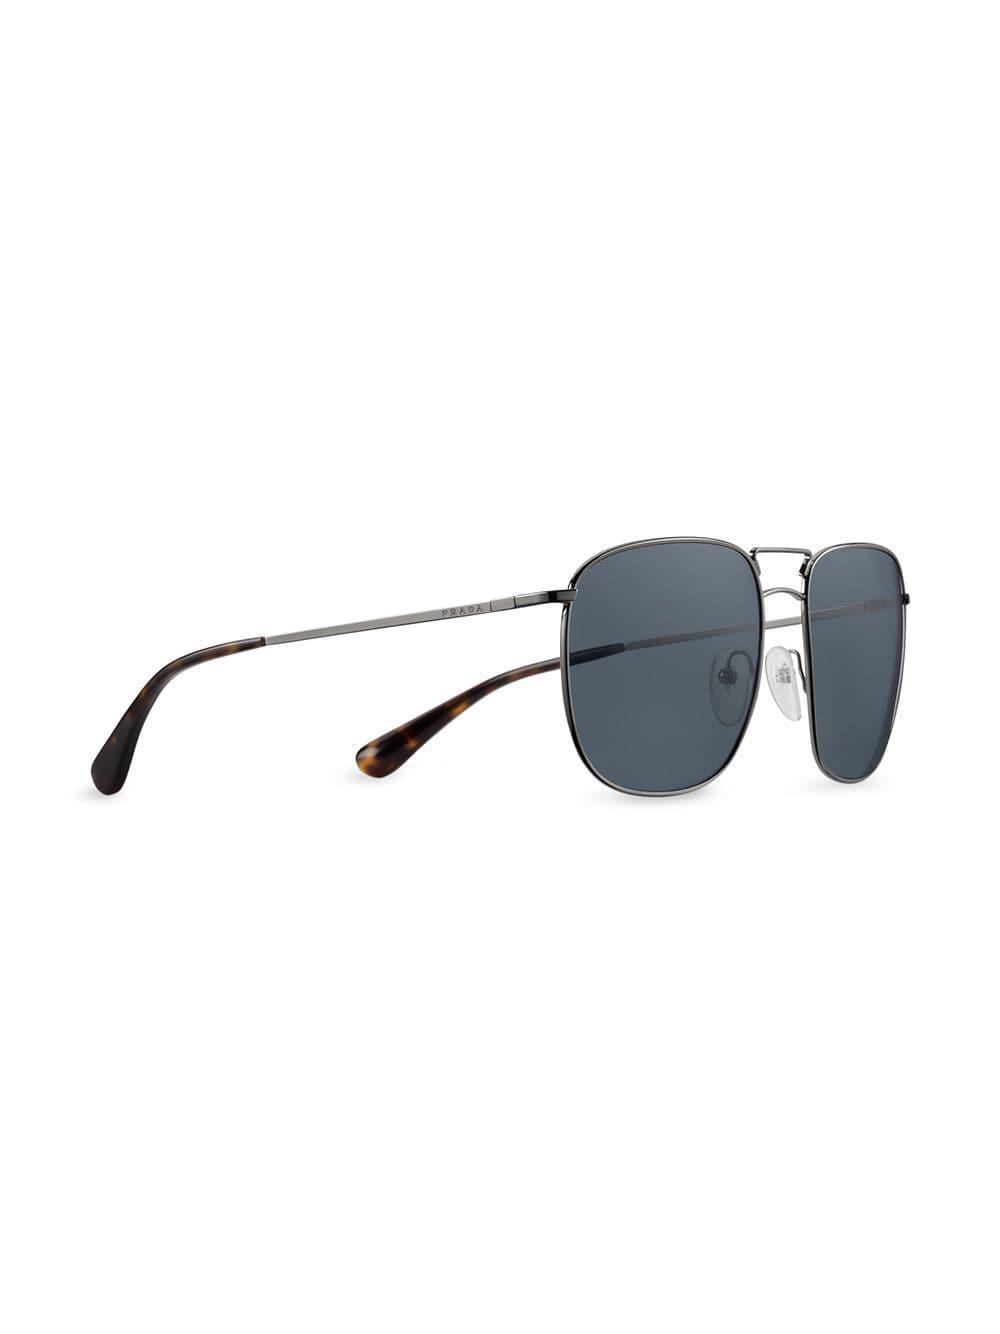 c101268e1fe49 Lyst - Prada Collection Sunglasses in Metallic for Men